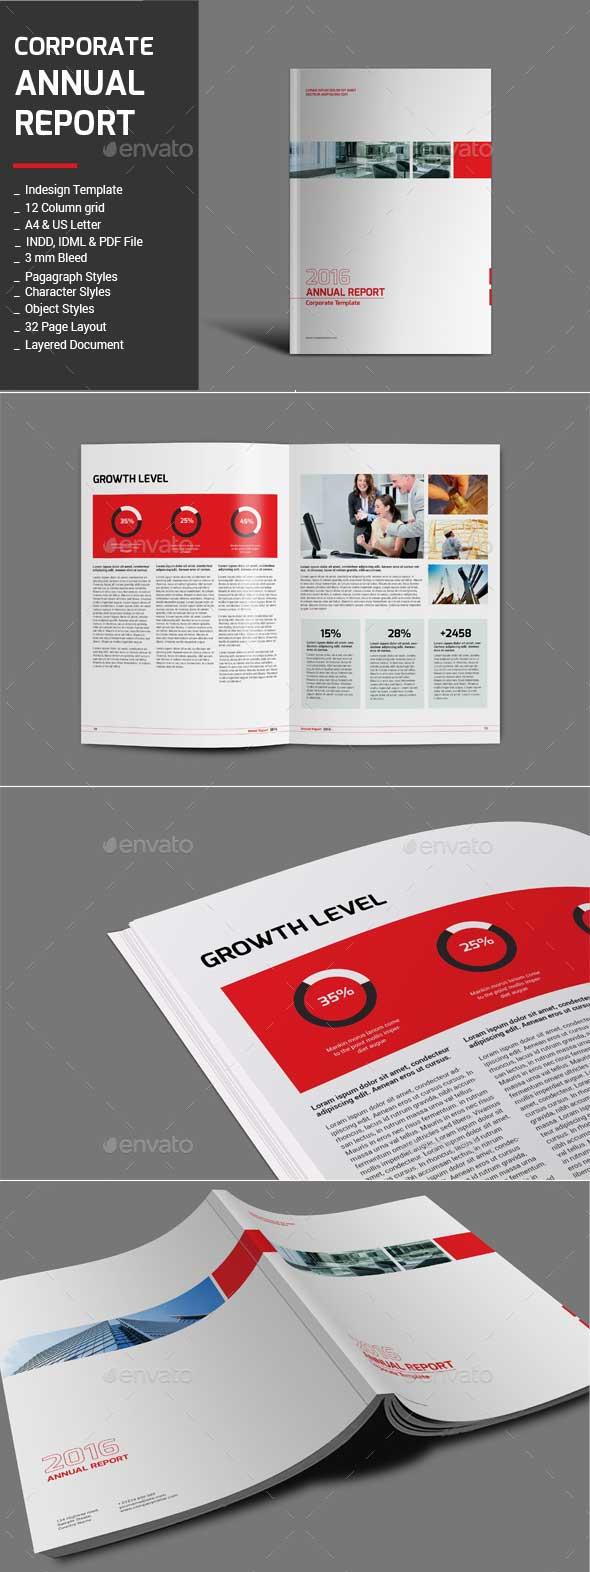 corporate-annual-report